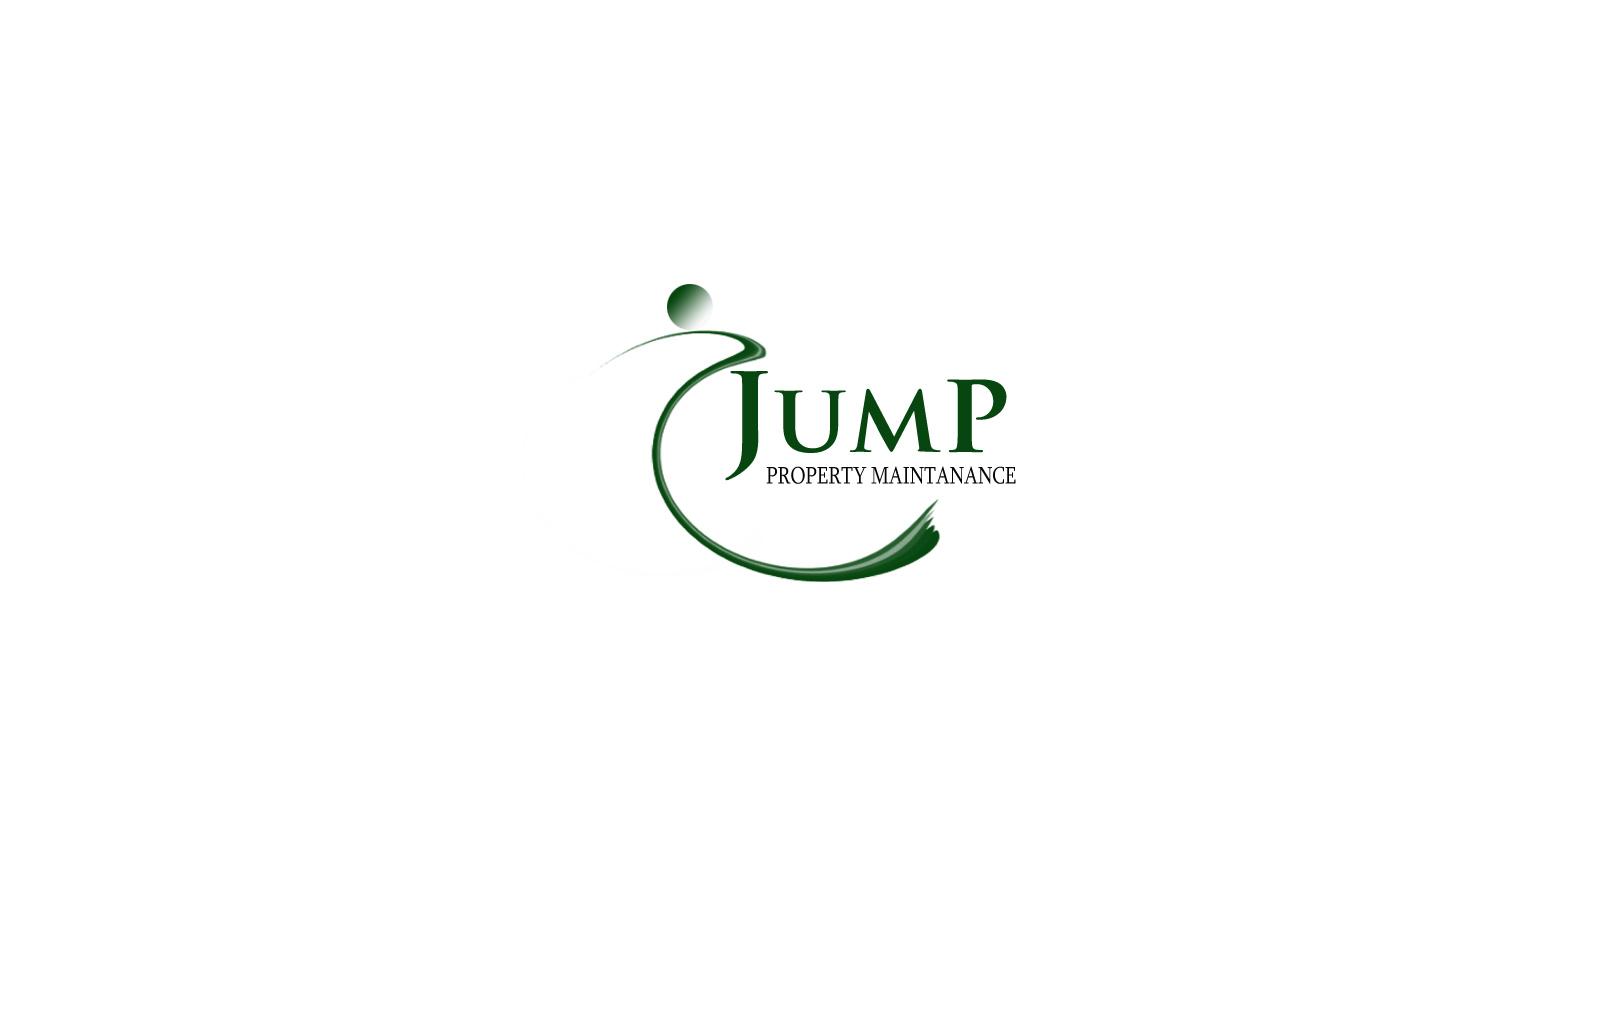 Logo Design by Dhruv Rajvansh - Entry No. 95 in the Logo Design Contest Creative Logo Design for Jump Property Maintenance.